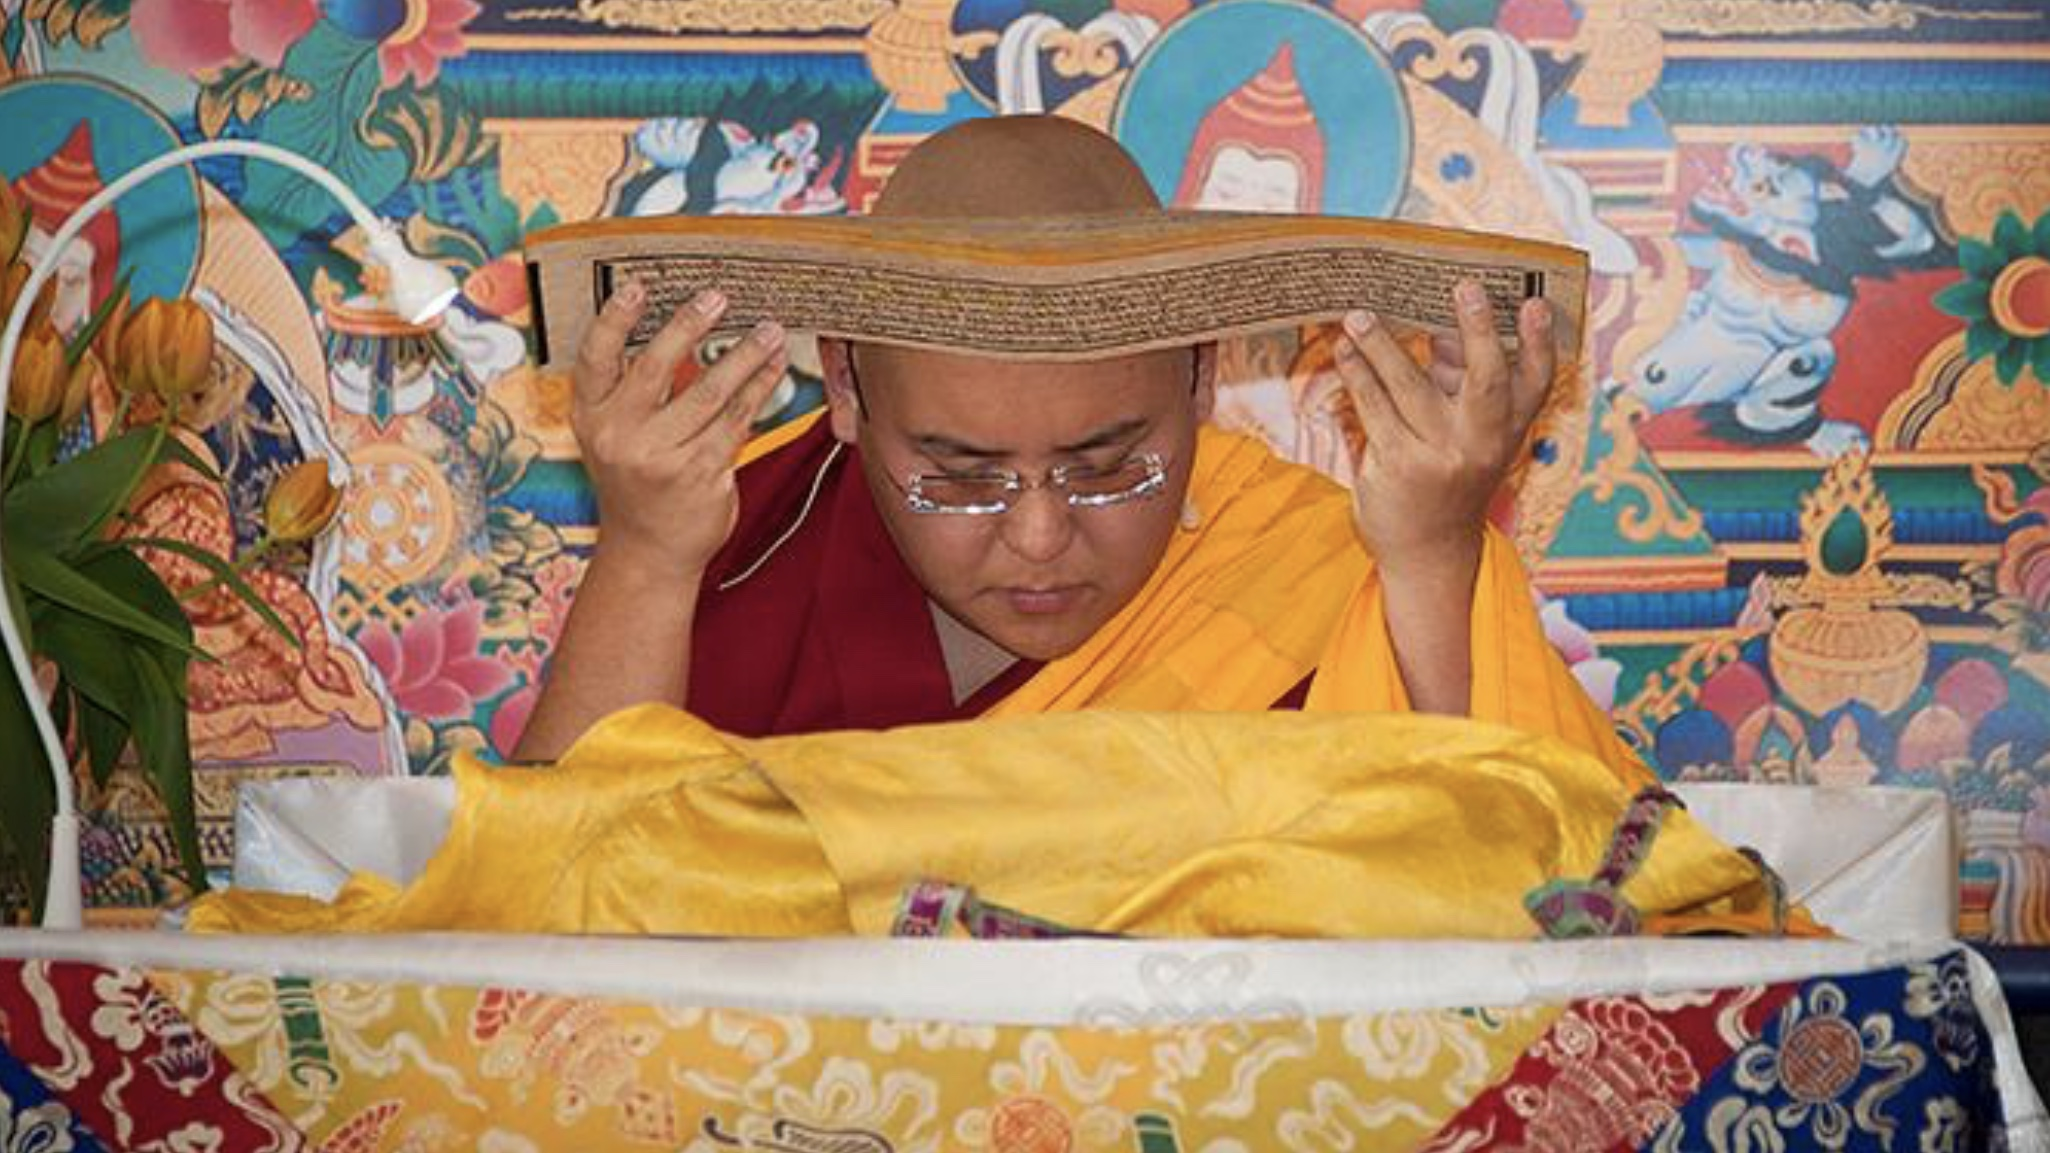 His Eminence Ling Rinpoche, incarnation of His Holiness the Dalai Lama's Senior Tutuor, teaching at Istituto Lama Tsong Khapa, Italy, 2018. (Photo Piero Sirianni)